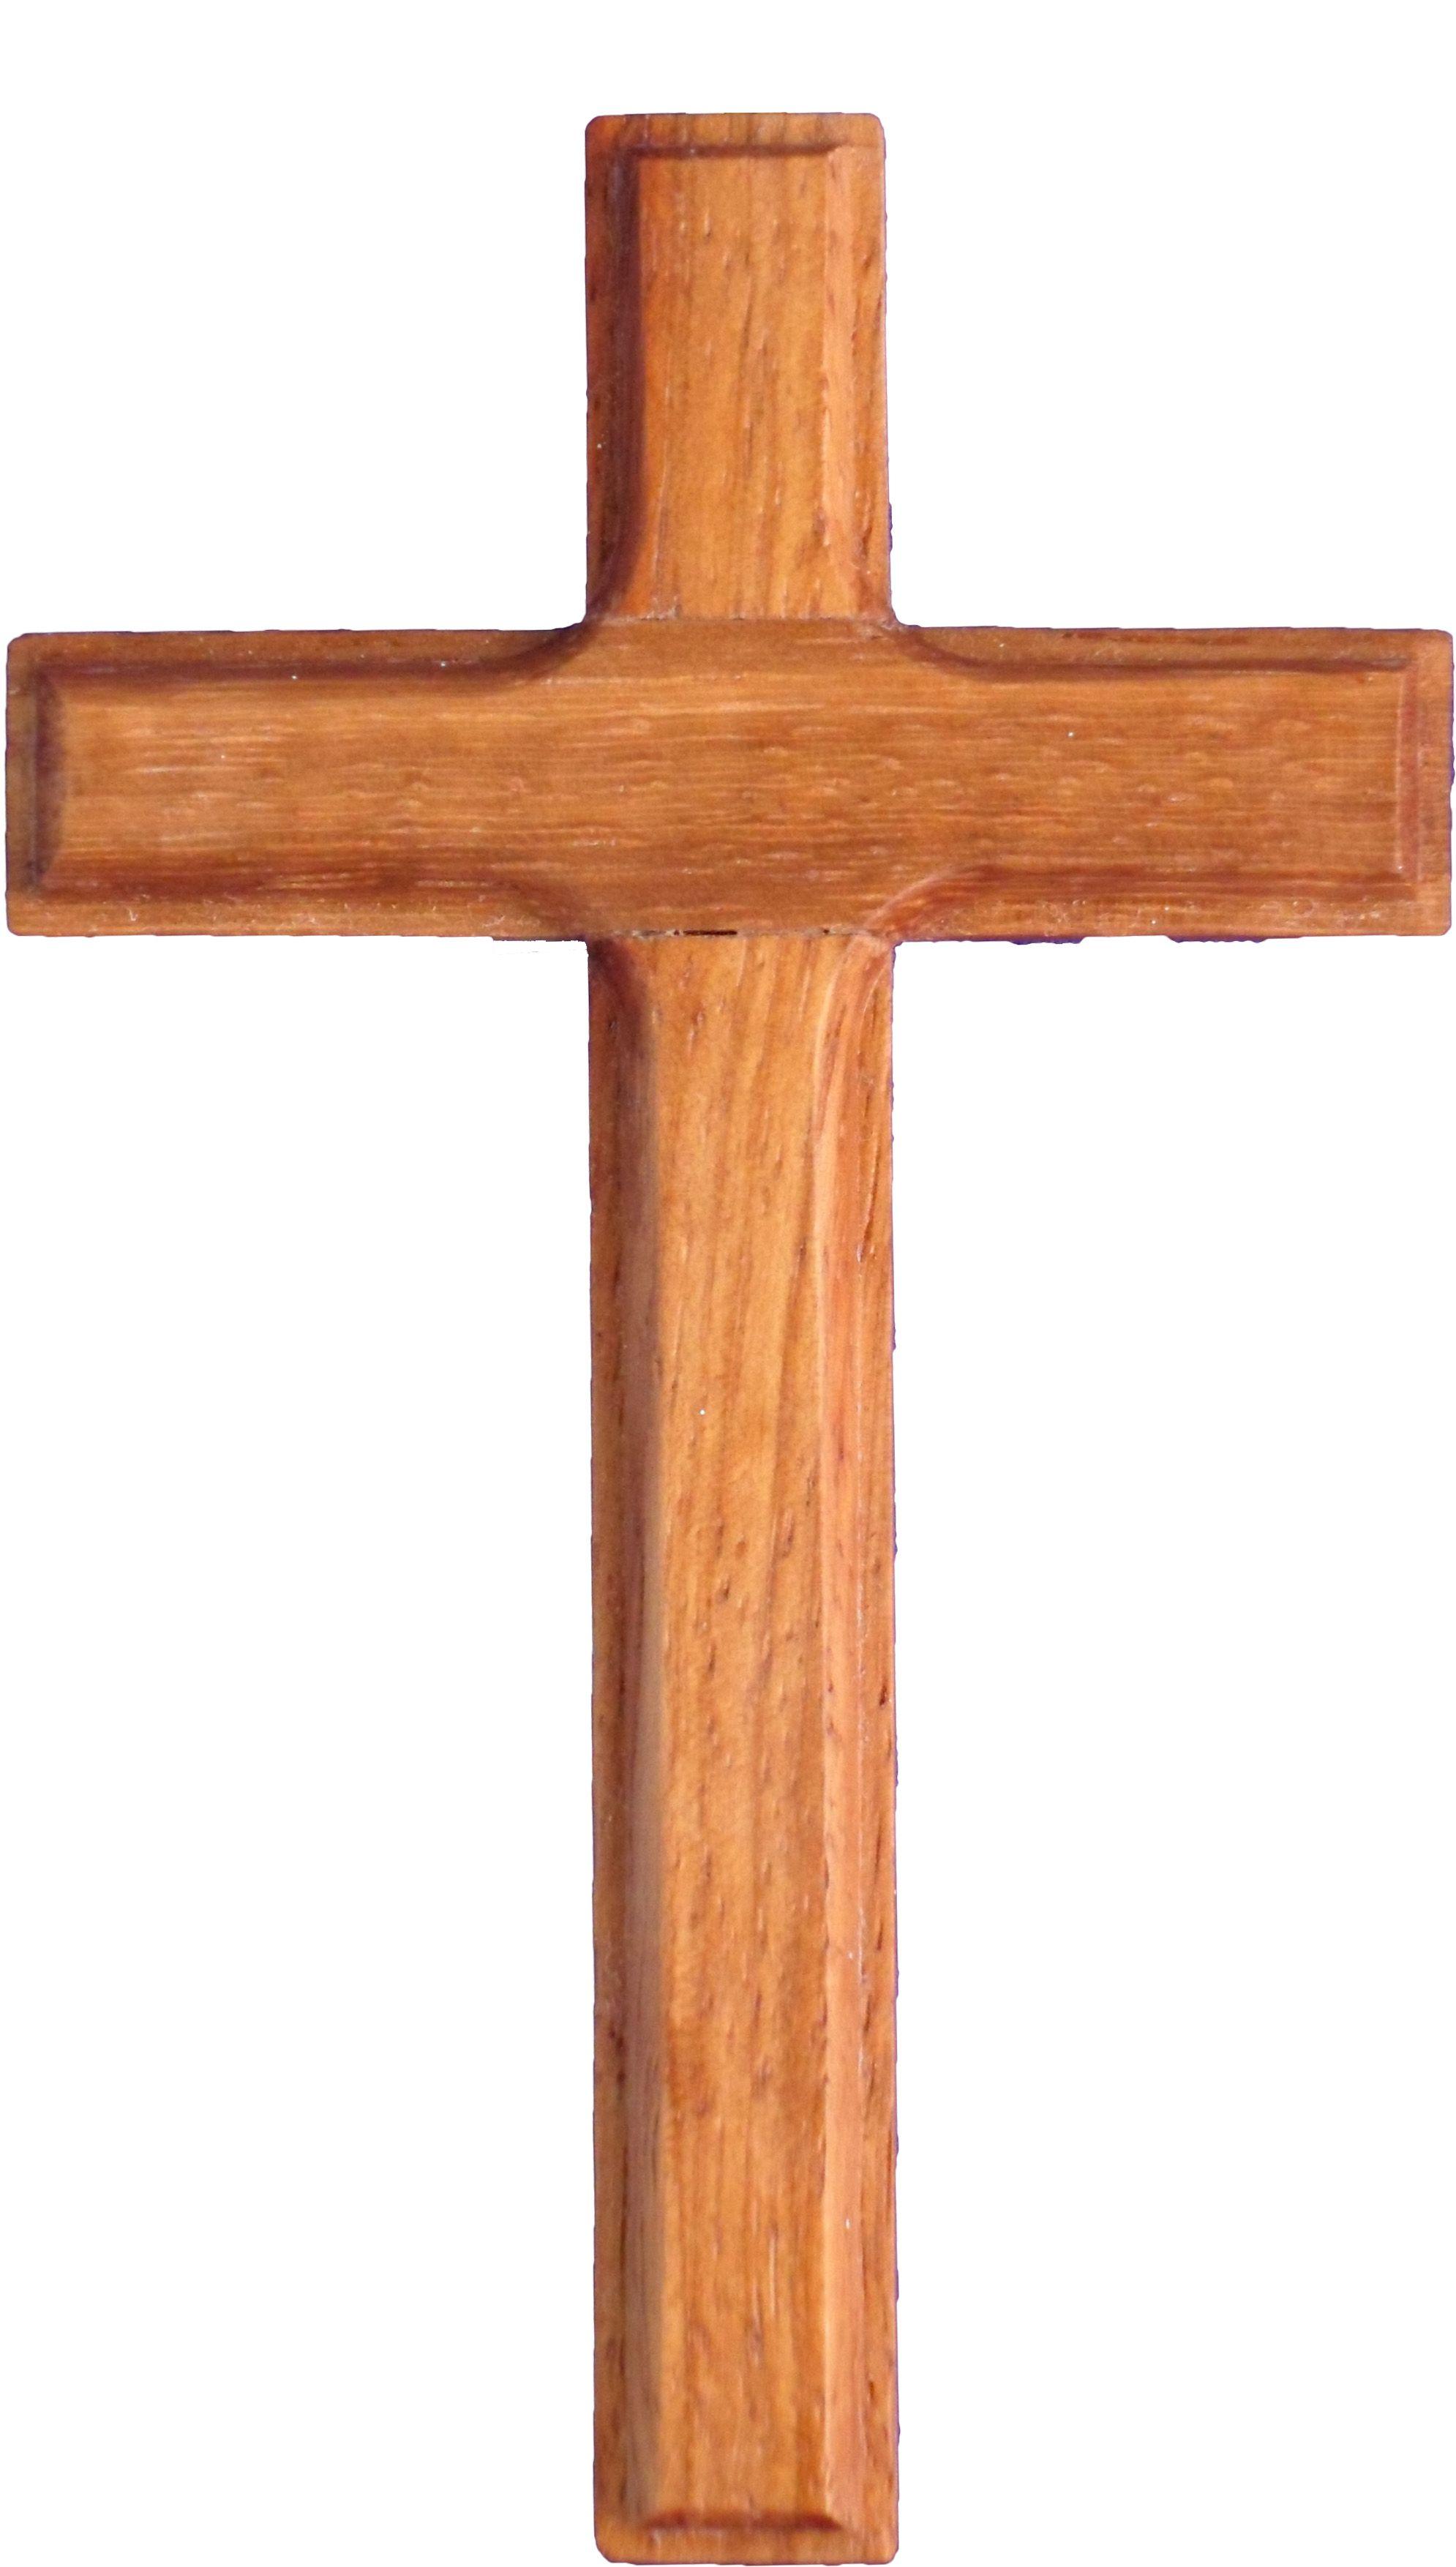 Wooden Cross - 12cm (h) - Shape | 3D Animation - Room ...